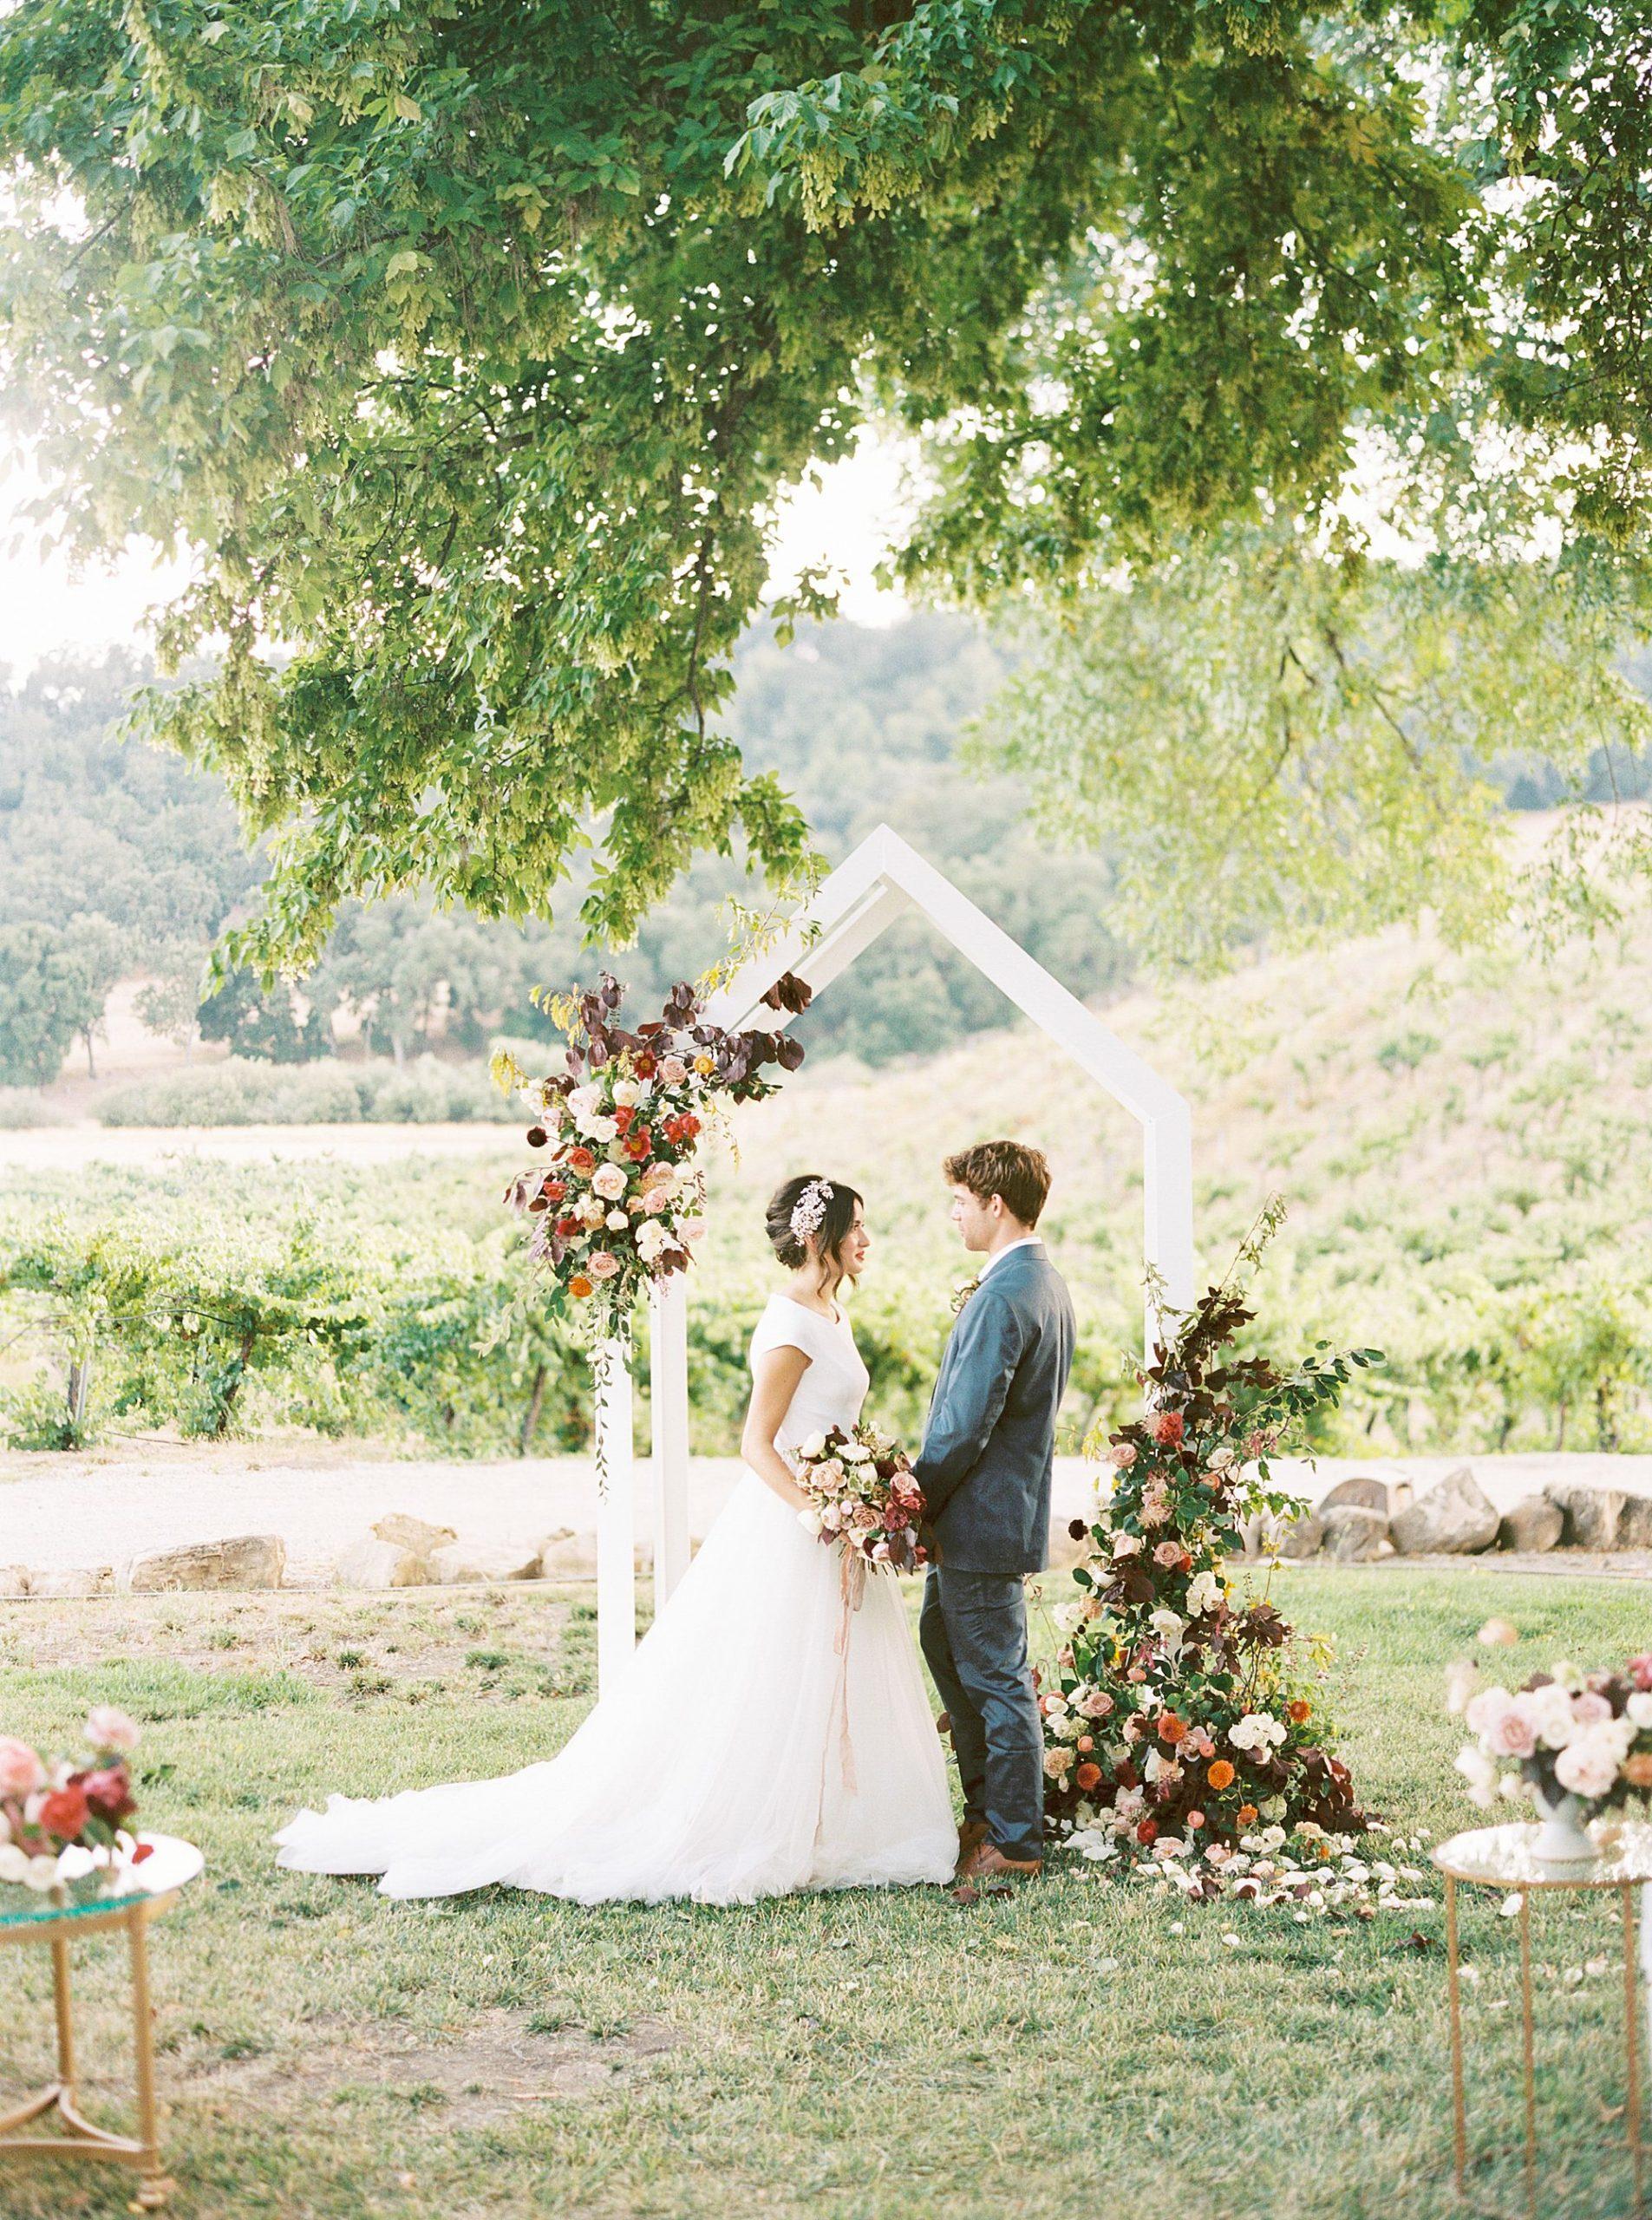 HammerSky Wedding Inspiration Featured on Hey Wedding Lady with Vanessa Noel Events - Ashley Baumgartner - SLO Wedding Photographer_0028.jpg